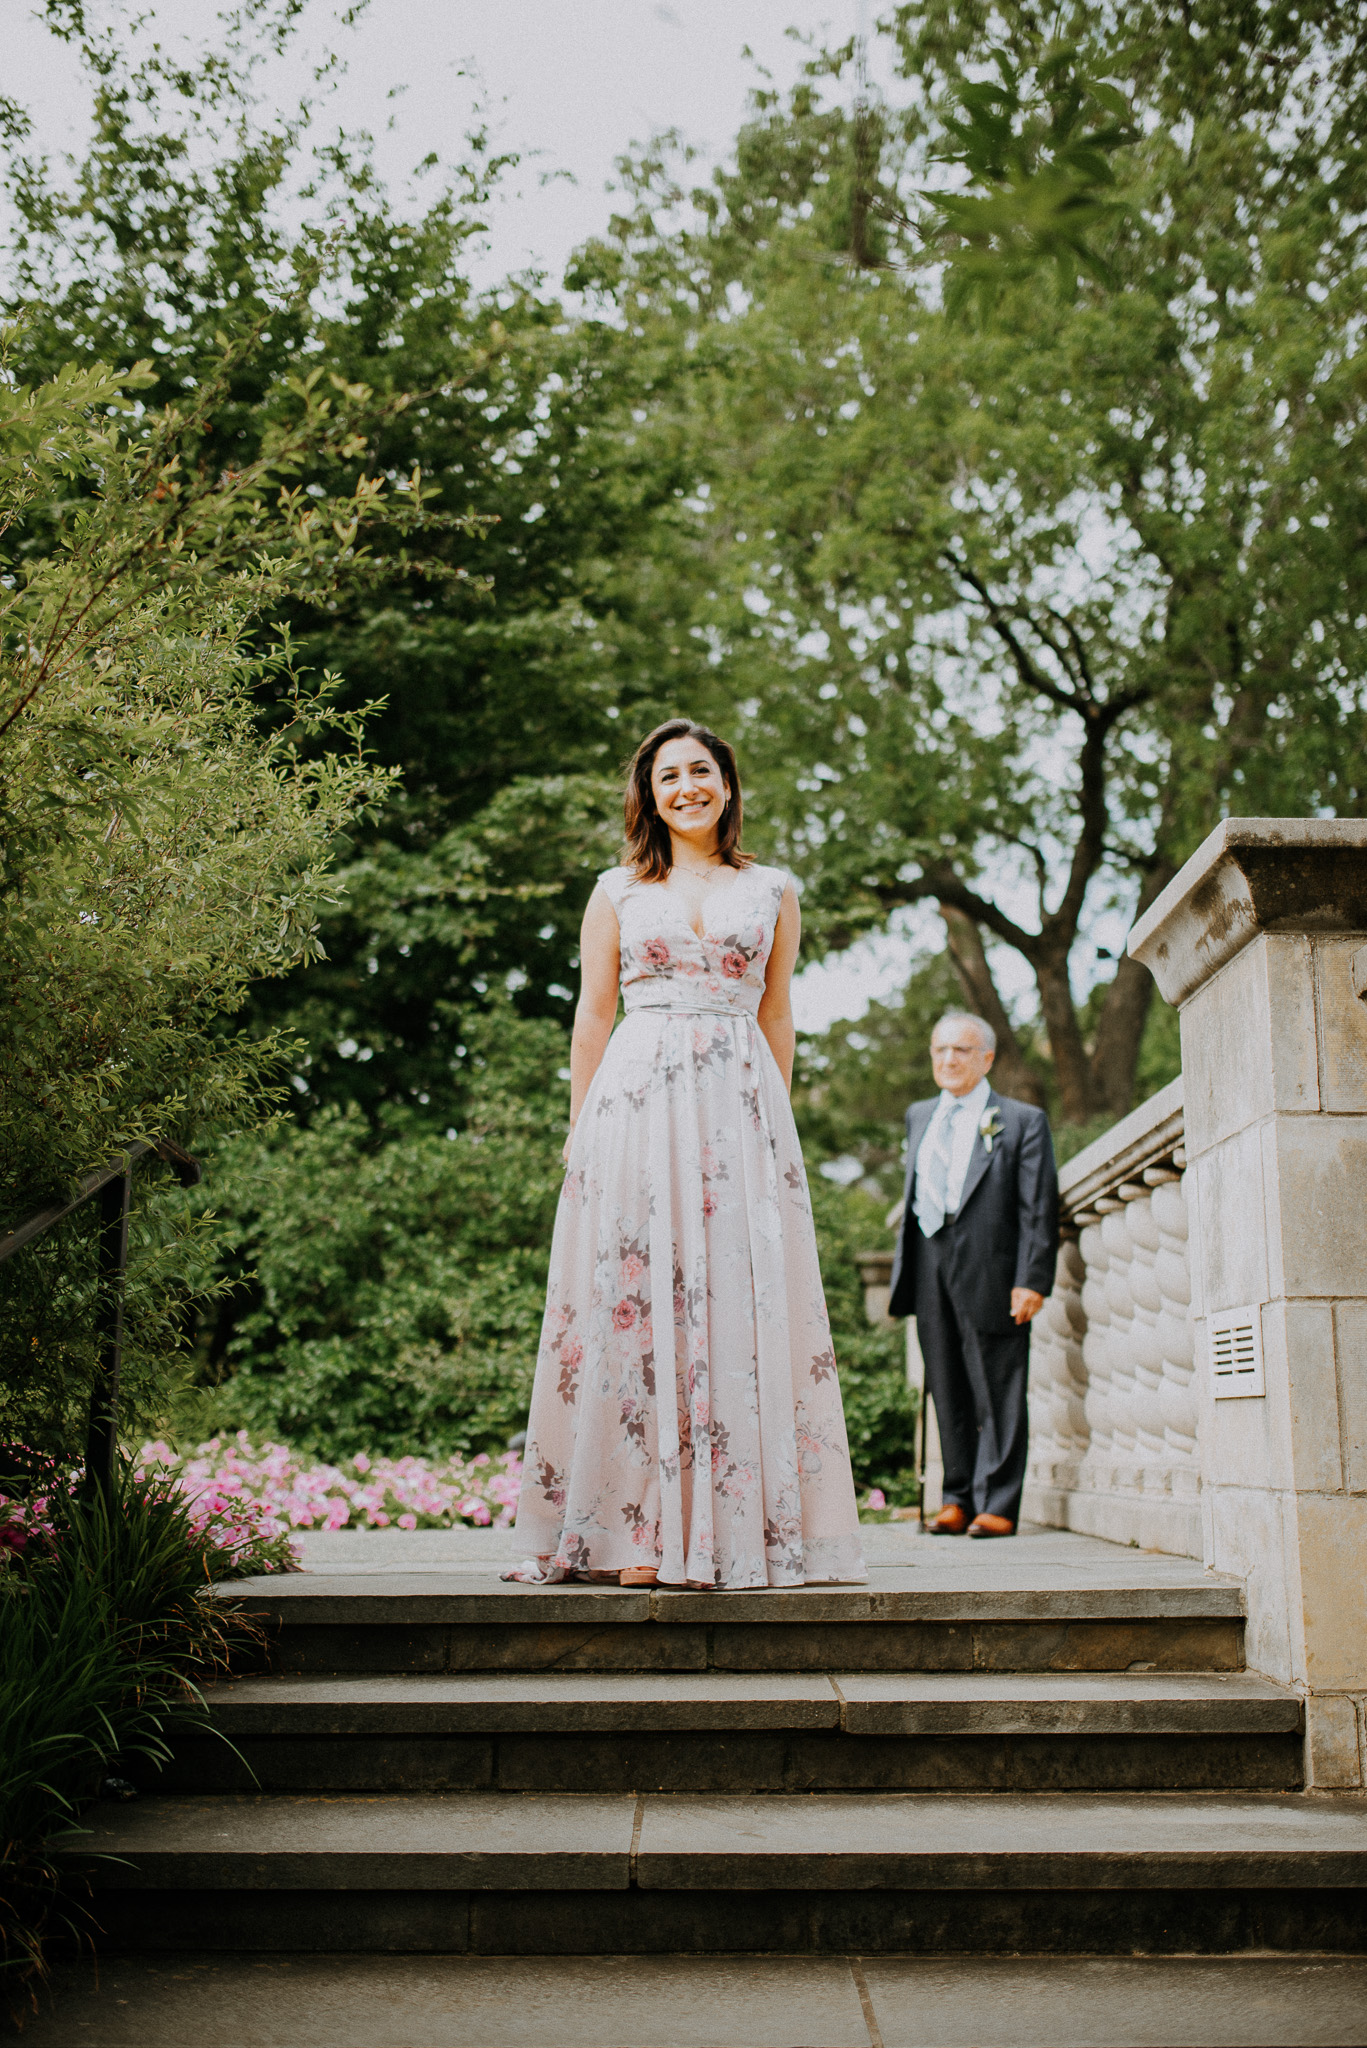 Dallas-fort-worth-wedding-photographer-dallas-arboretum-intimate-wedding-dallas-texas-03